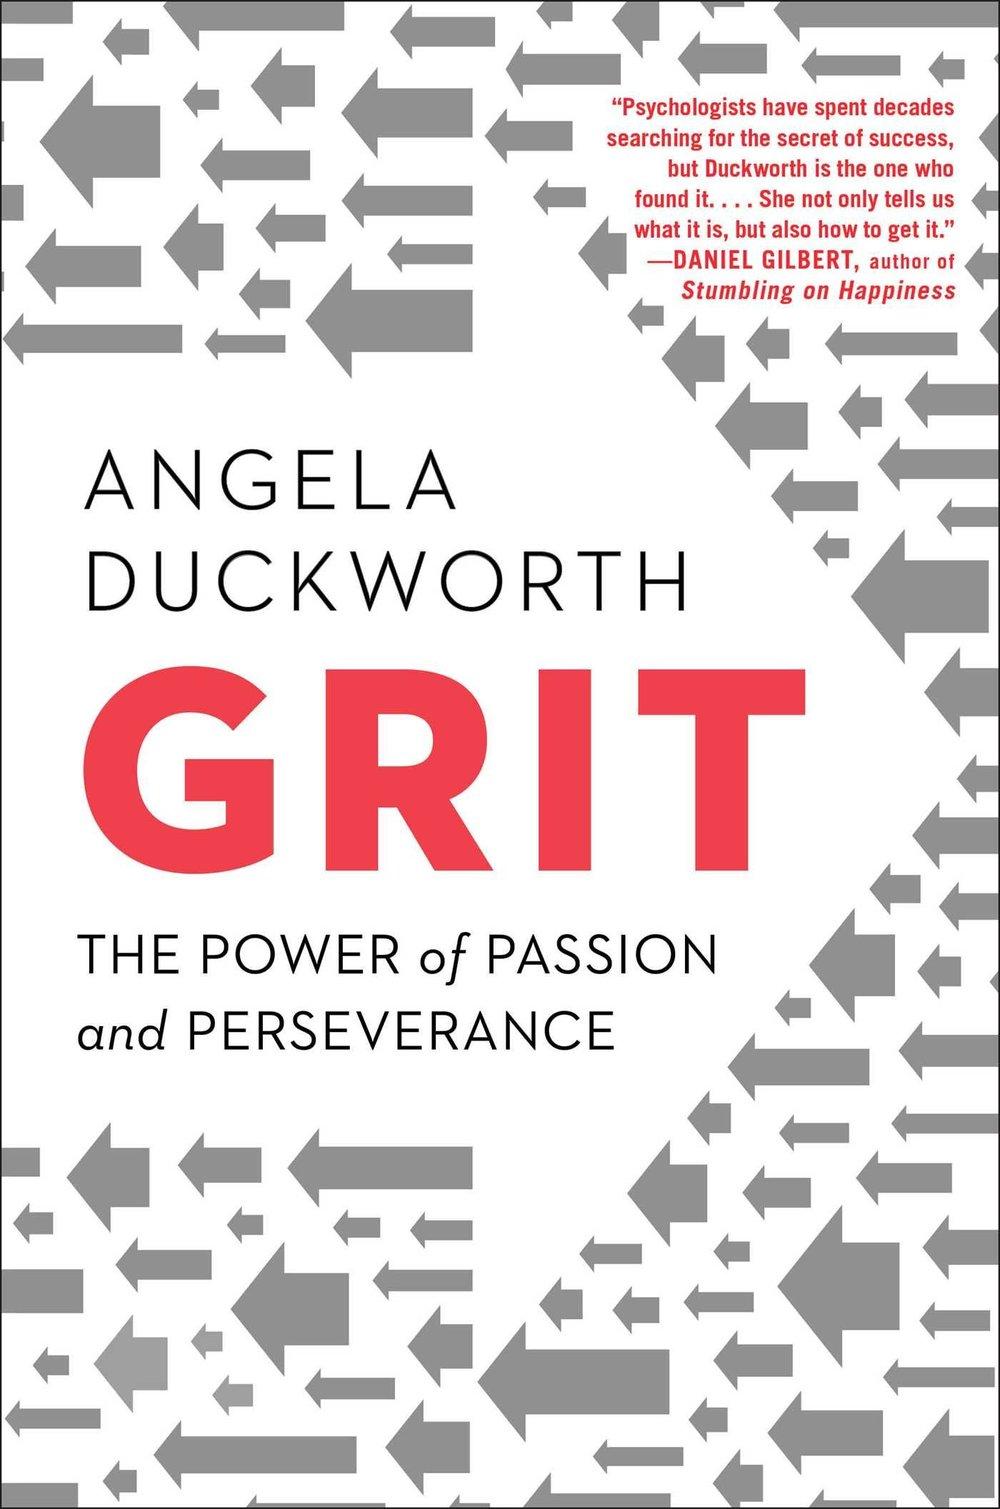 Grit_Angela Duckworth.jpg